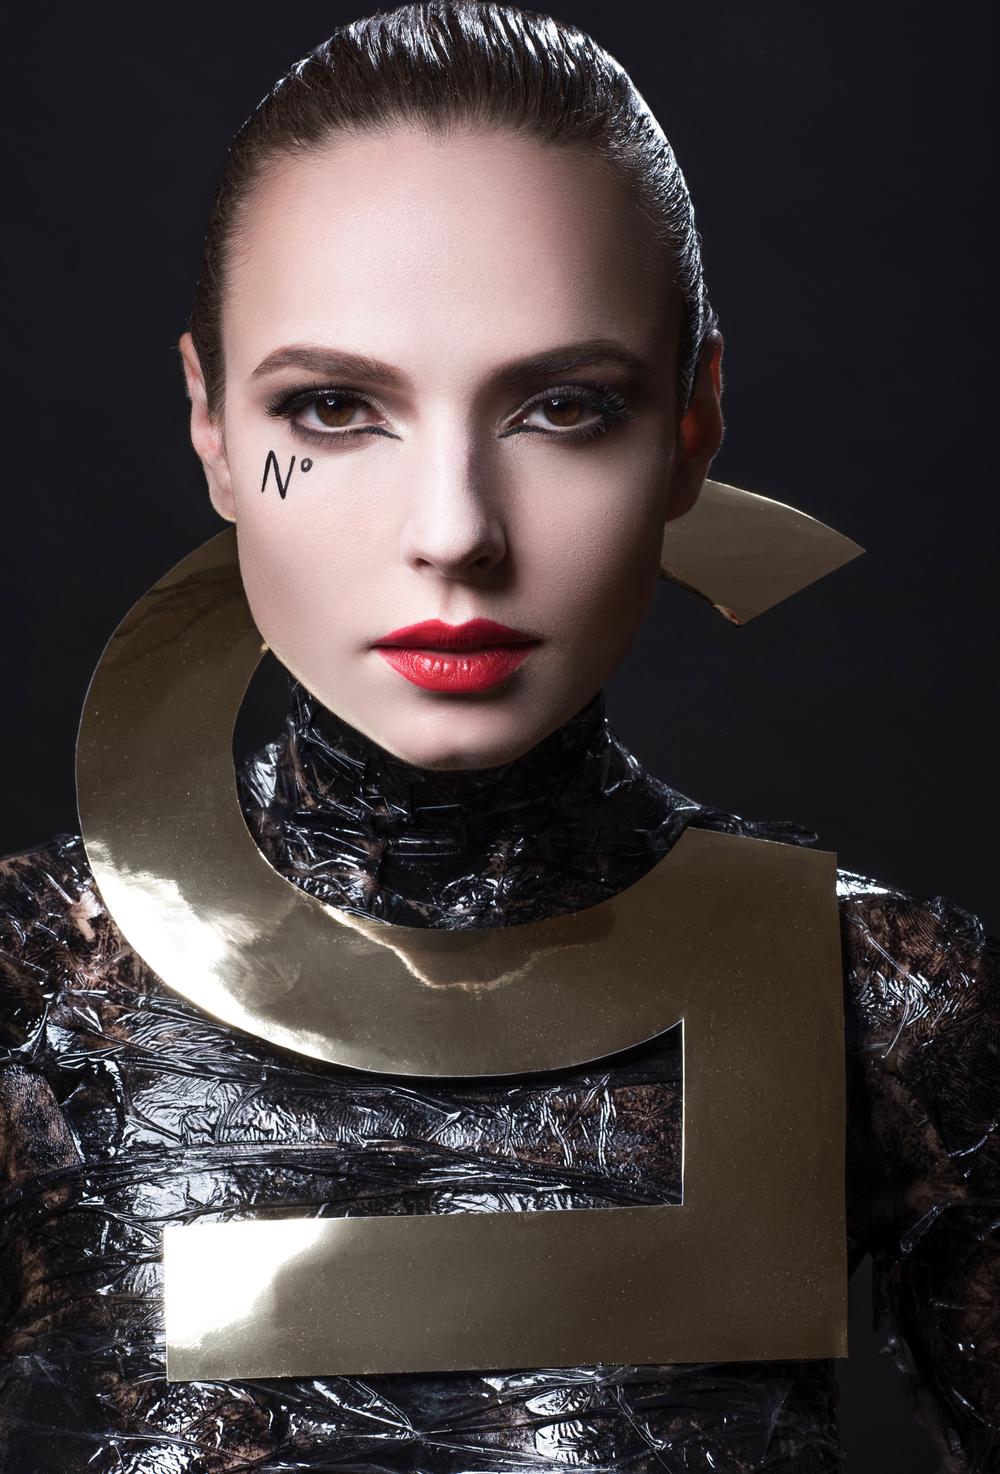 Los Angeles Beauty photographer - Andrea Marcu Chanel 503.jpg